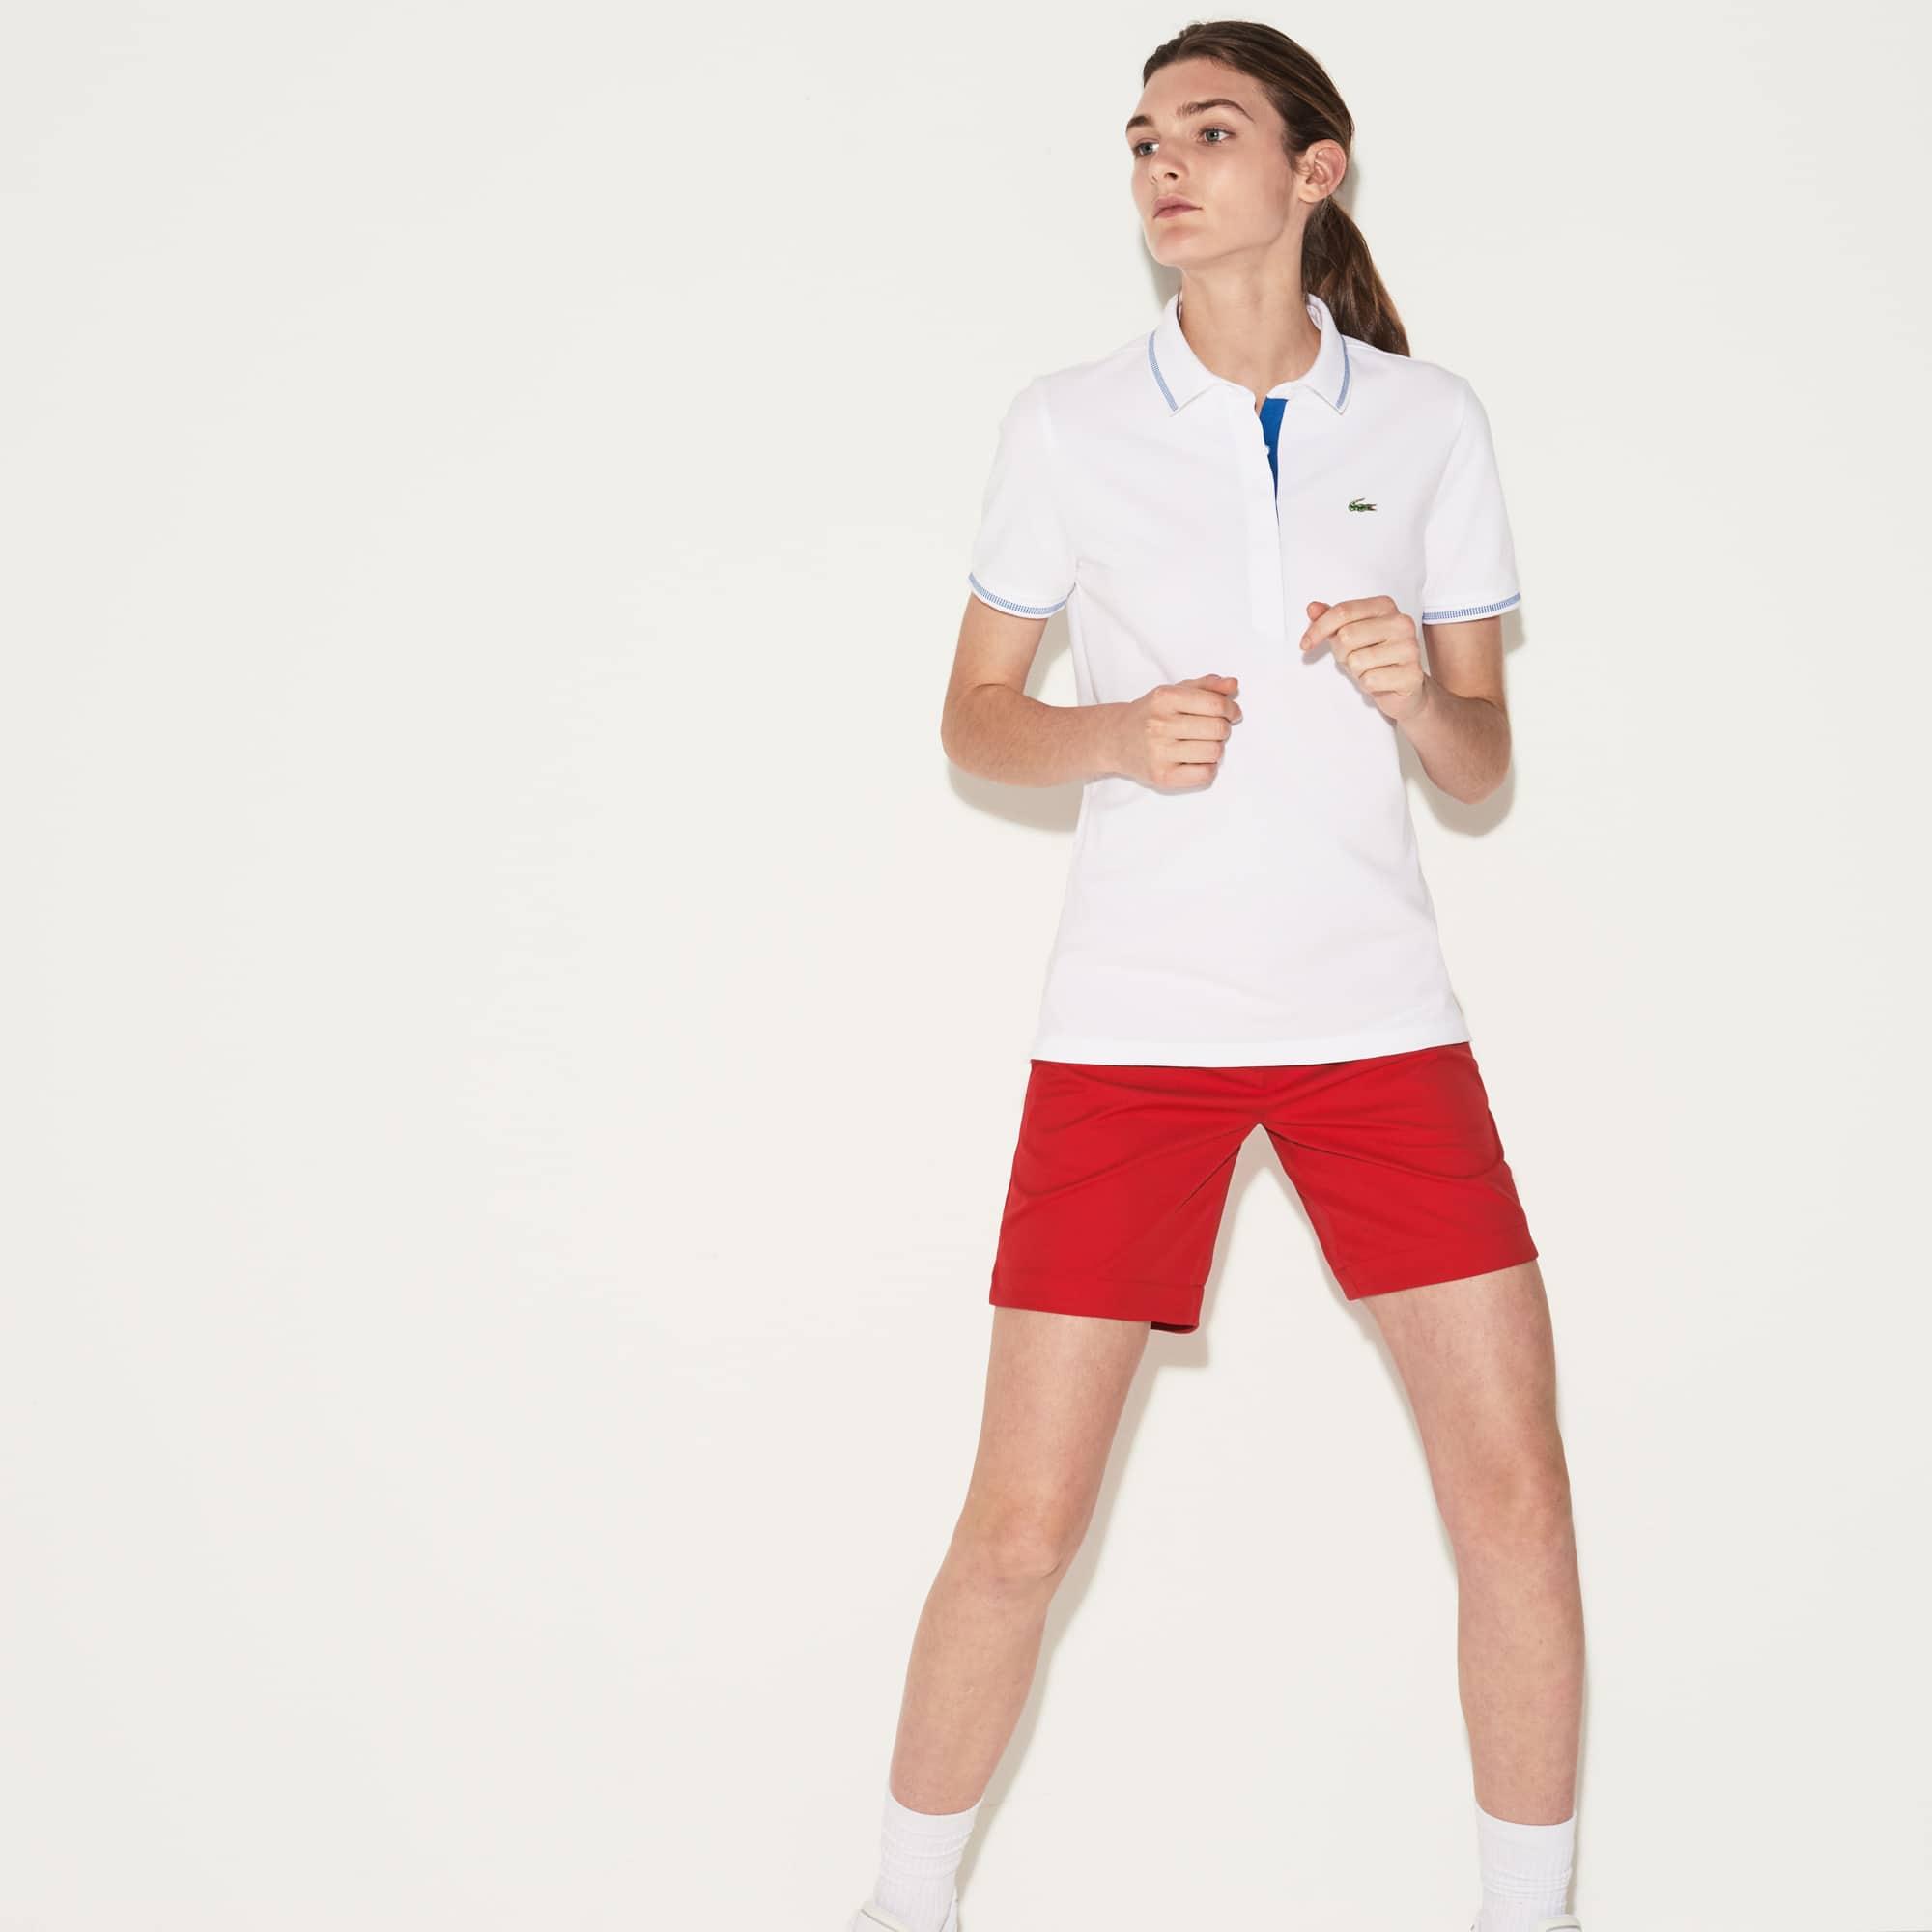 Women's Lacoste SPORT Light Stretch Technical Cotton Golf Polo Shirt